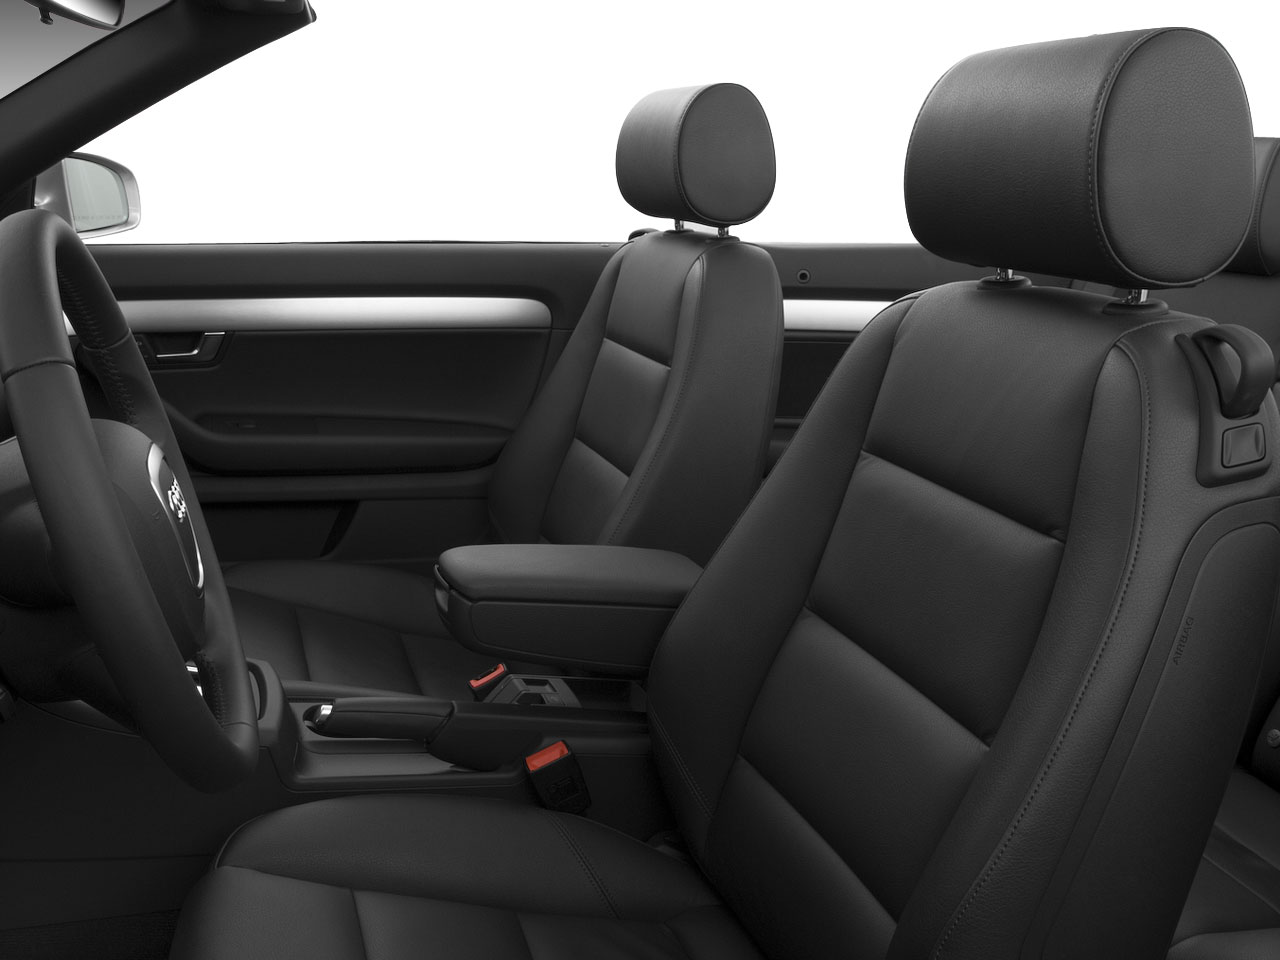 2007 audi rs4 car review road test automobile magazine. Black Bedroom Furniture Sets. Home Design Ideas